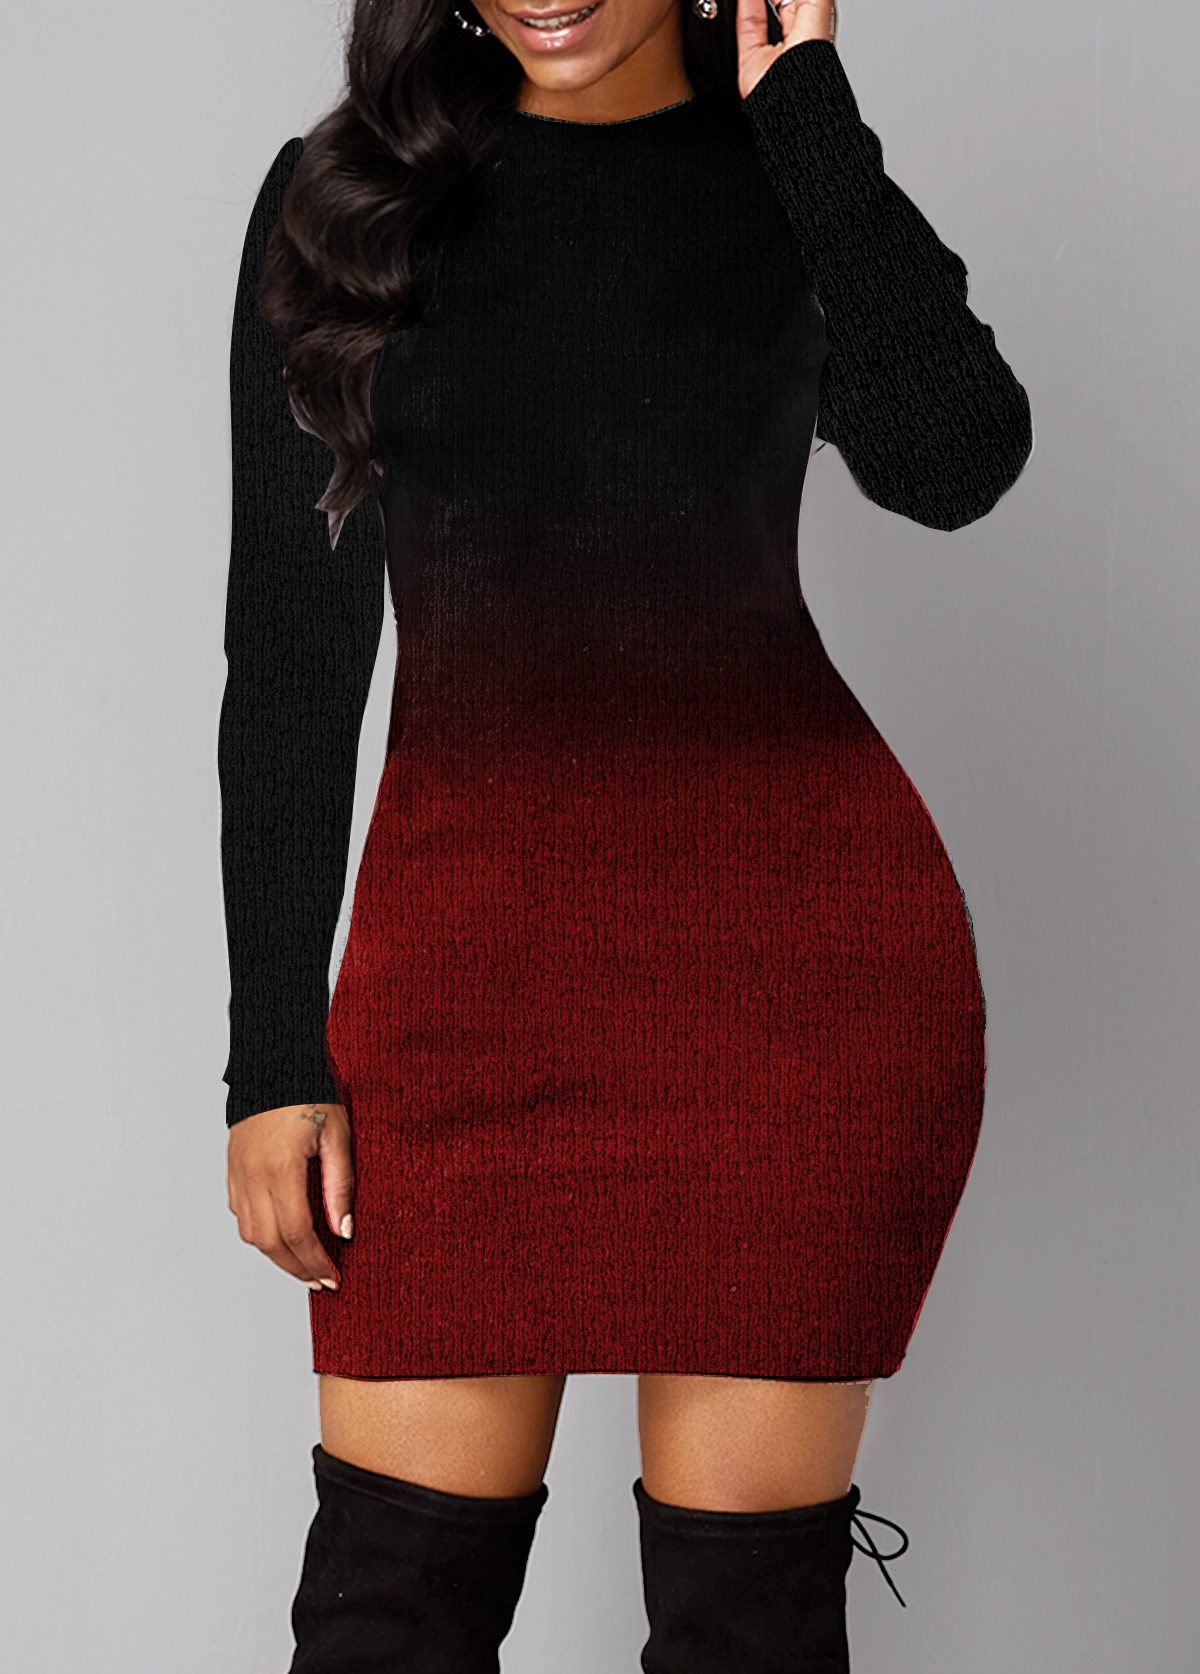 Long Sleeve Round Neck Gradient Sweater Dress